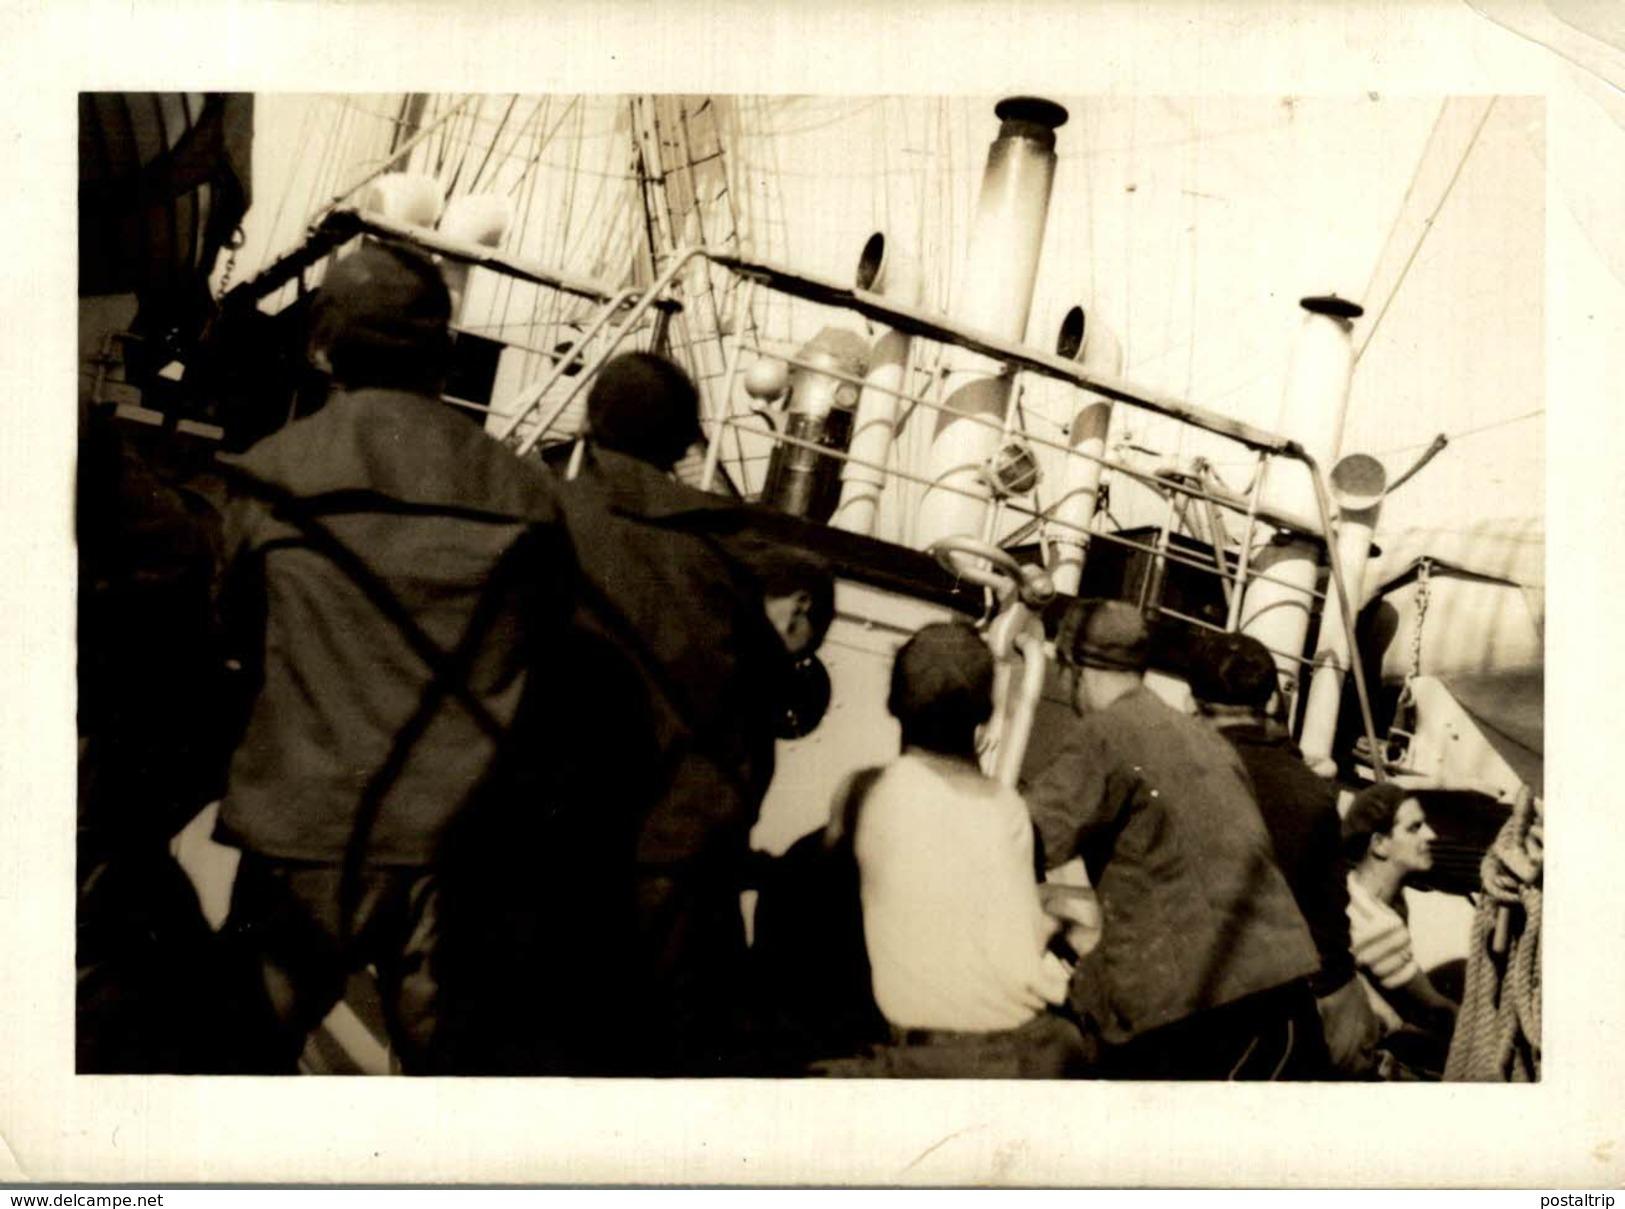 MERCATOR   CREW   FOTOS PRIVADO VIAJE MERCATOR 1940 +- 11.5 * 8CM Voilier - Velero Sailboat - Schiffe